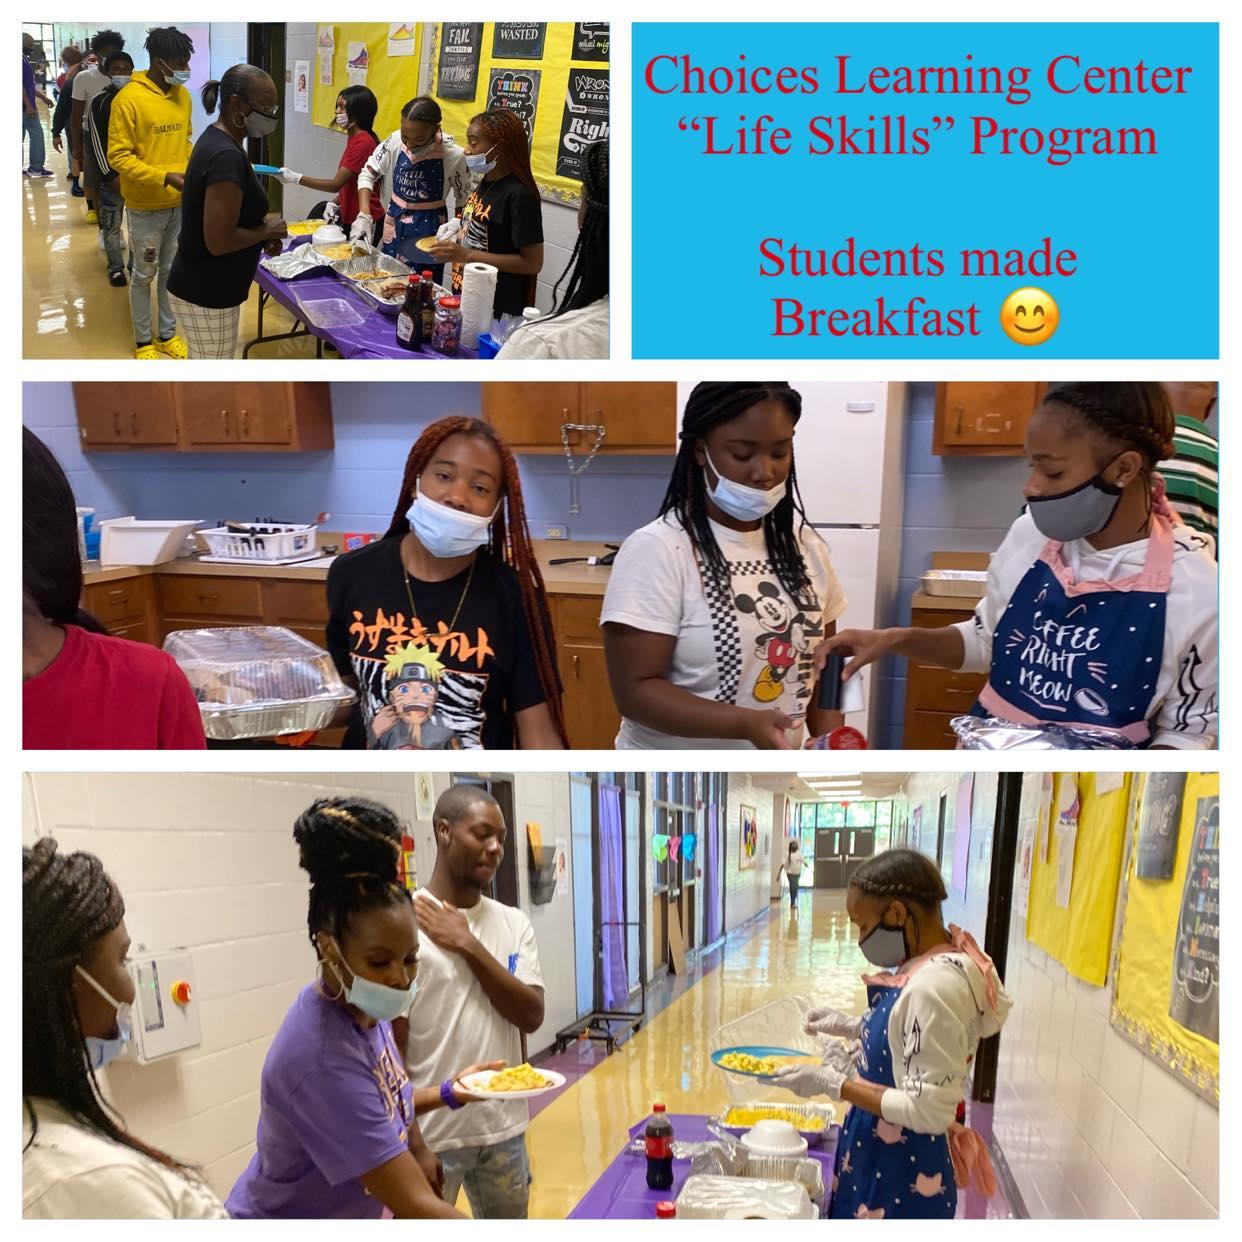 Students prepare breakfast